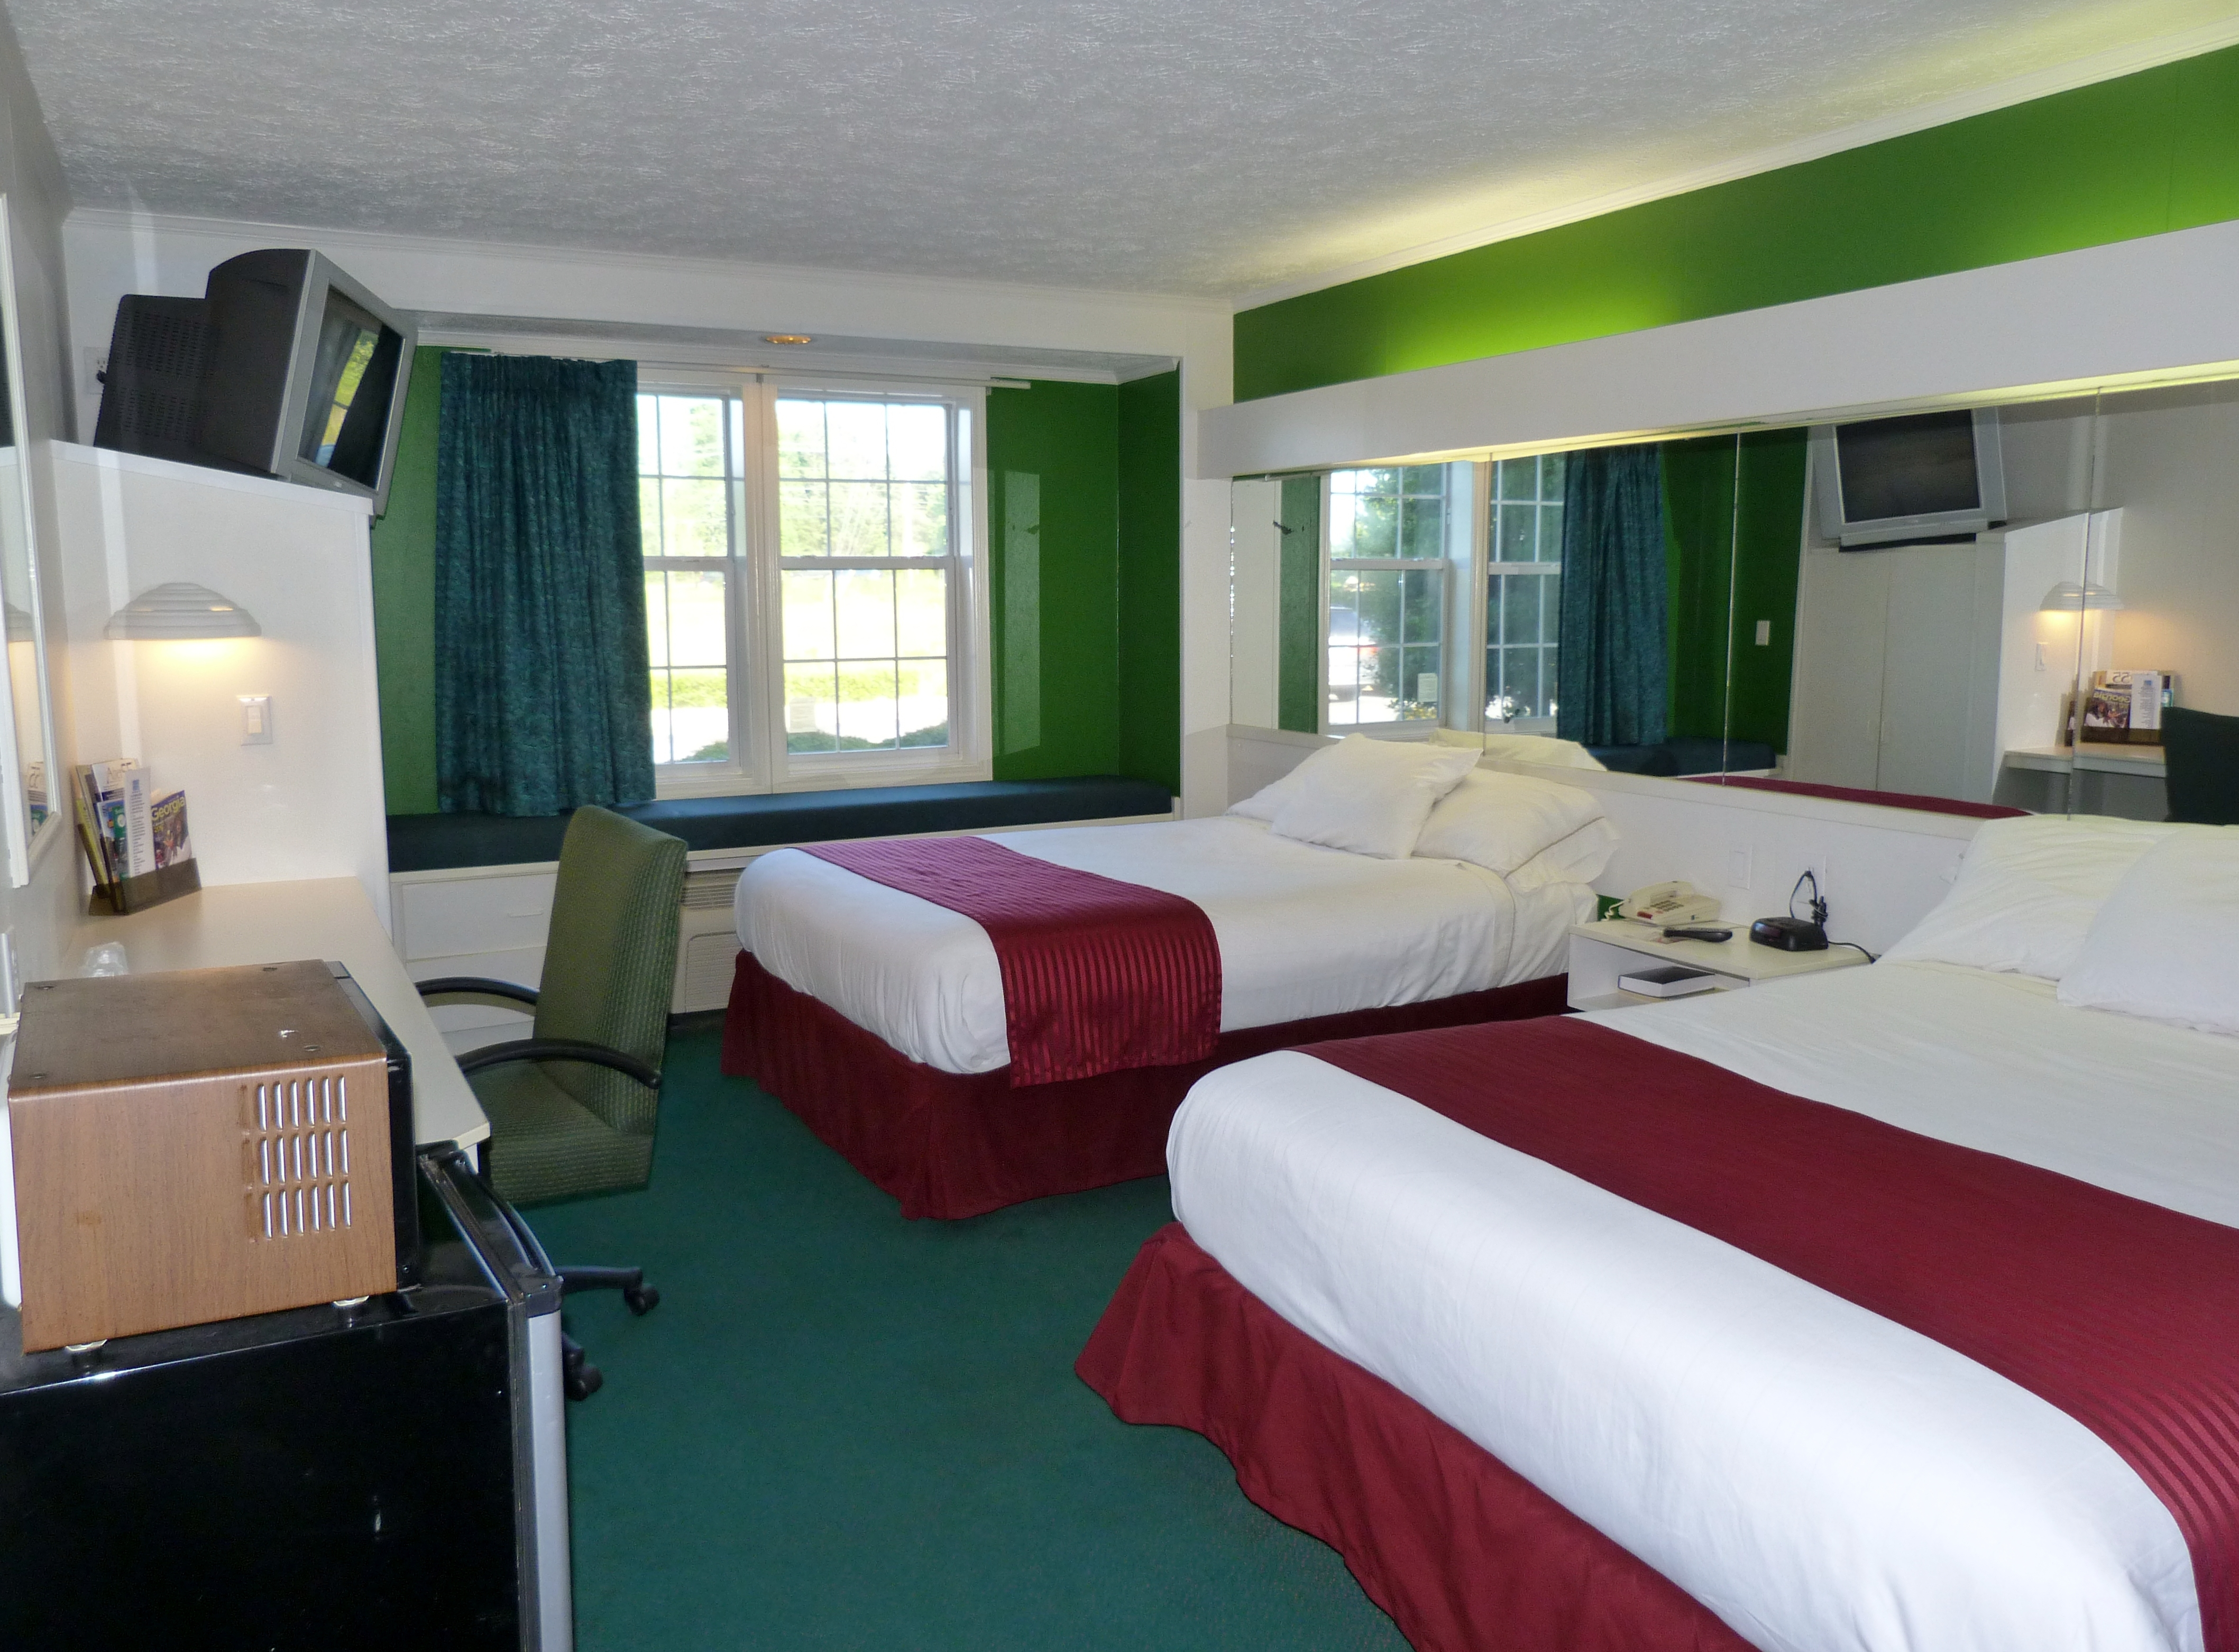 Holiday Lodge image 3